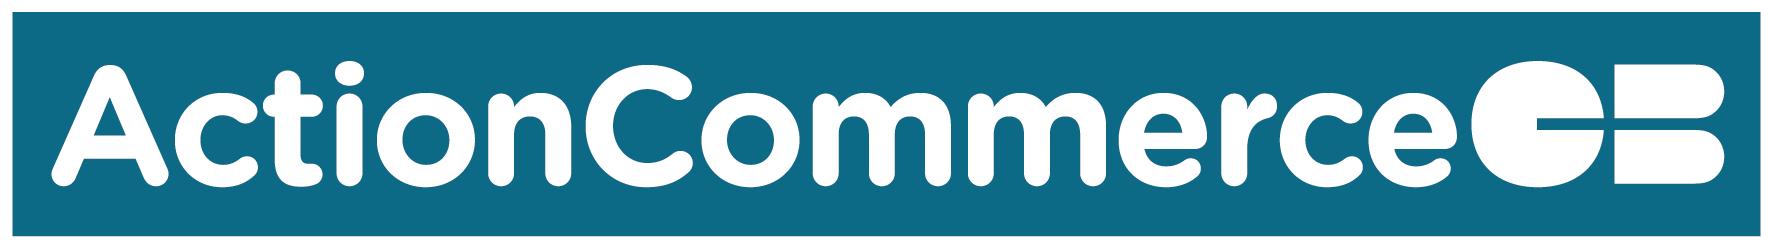 Logo ActionCommerceCB